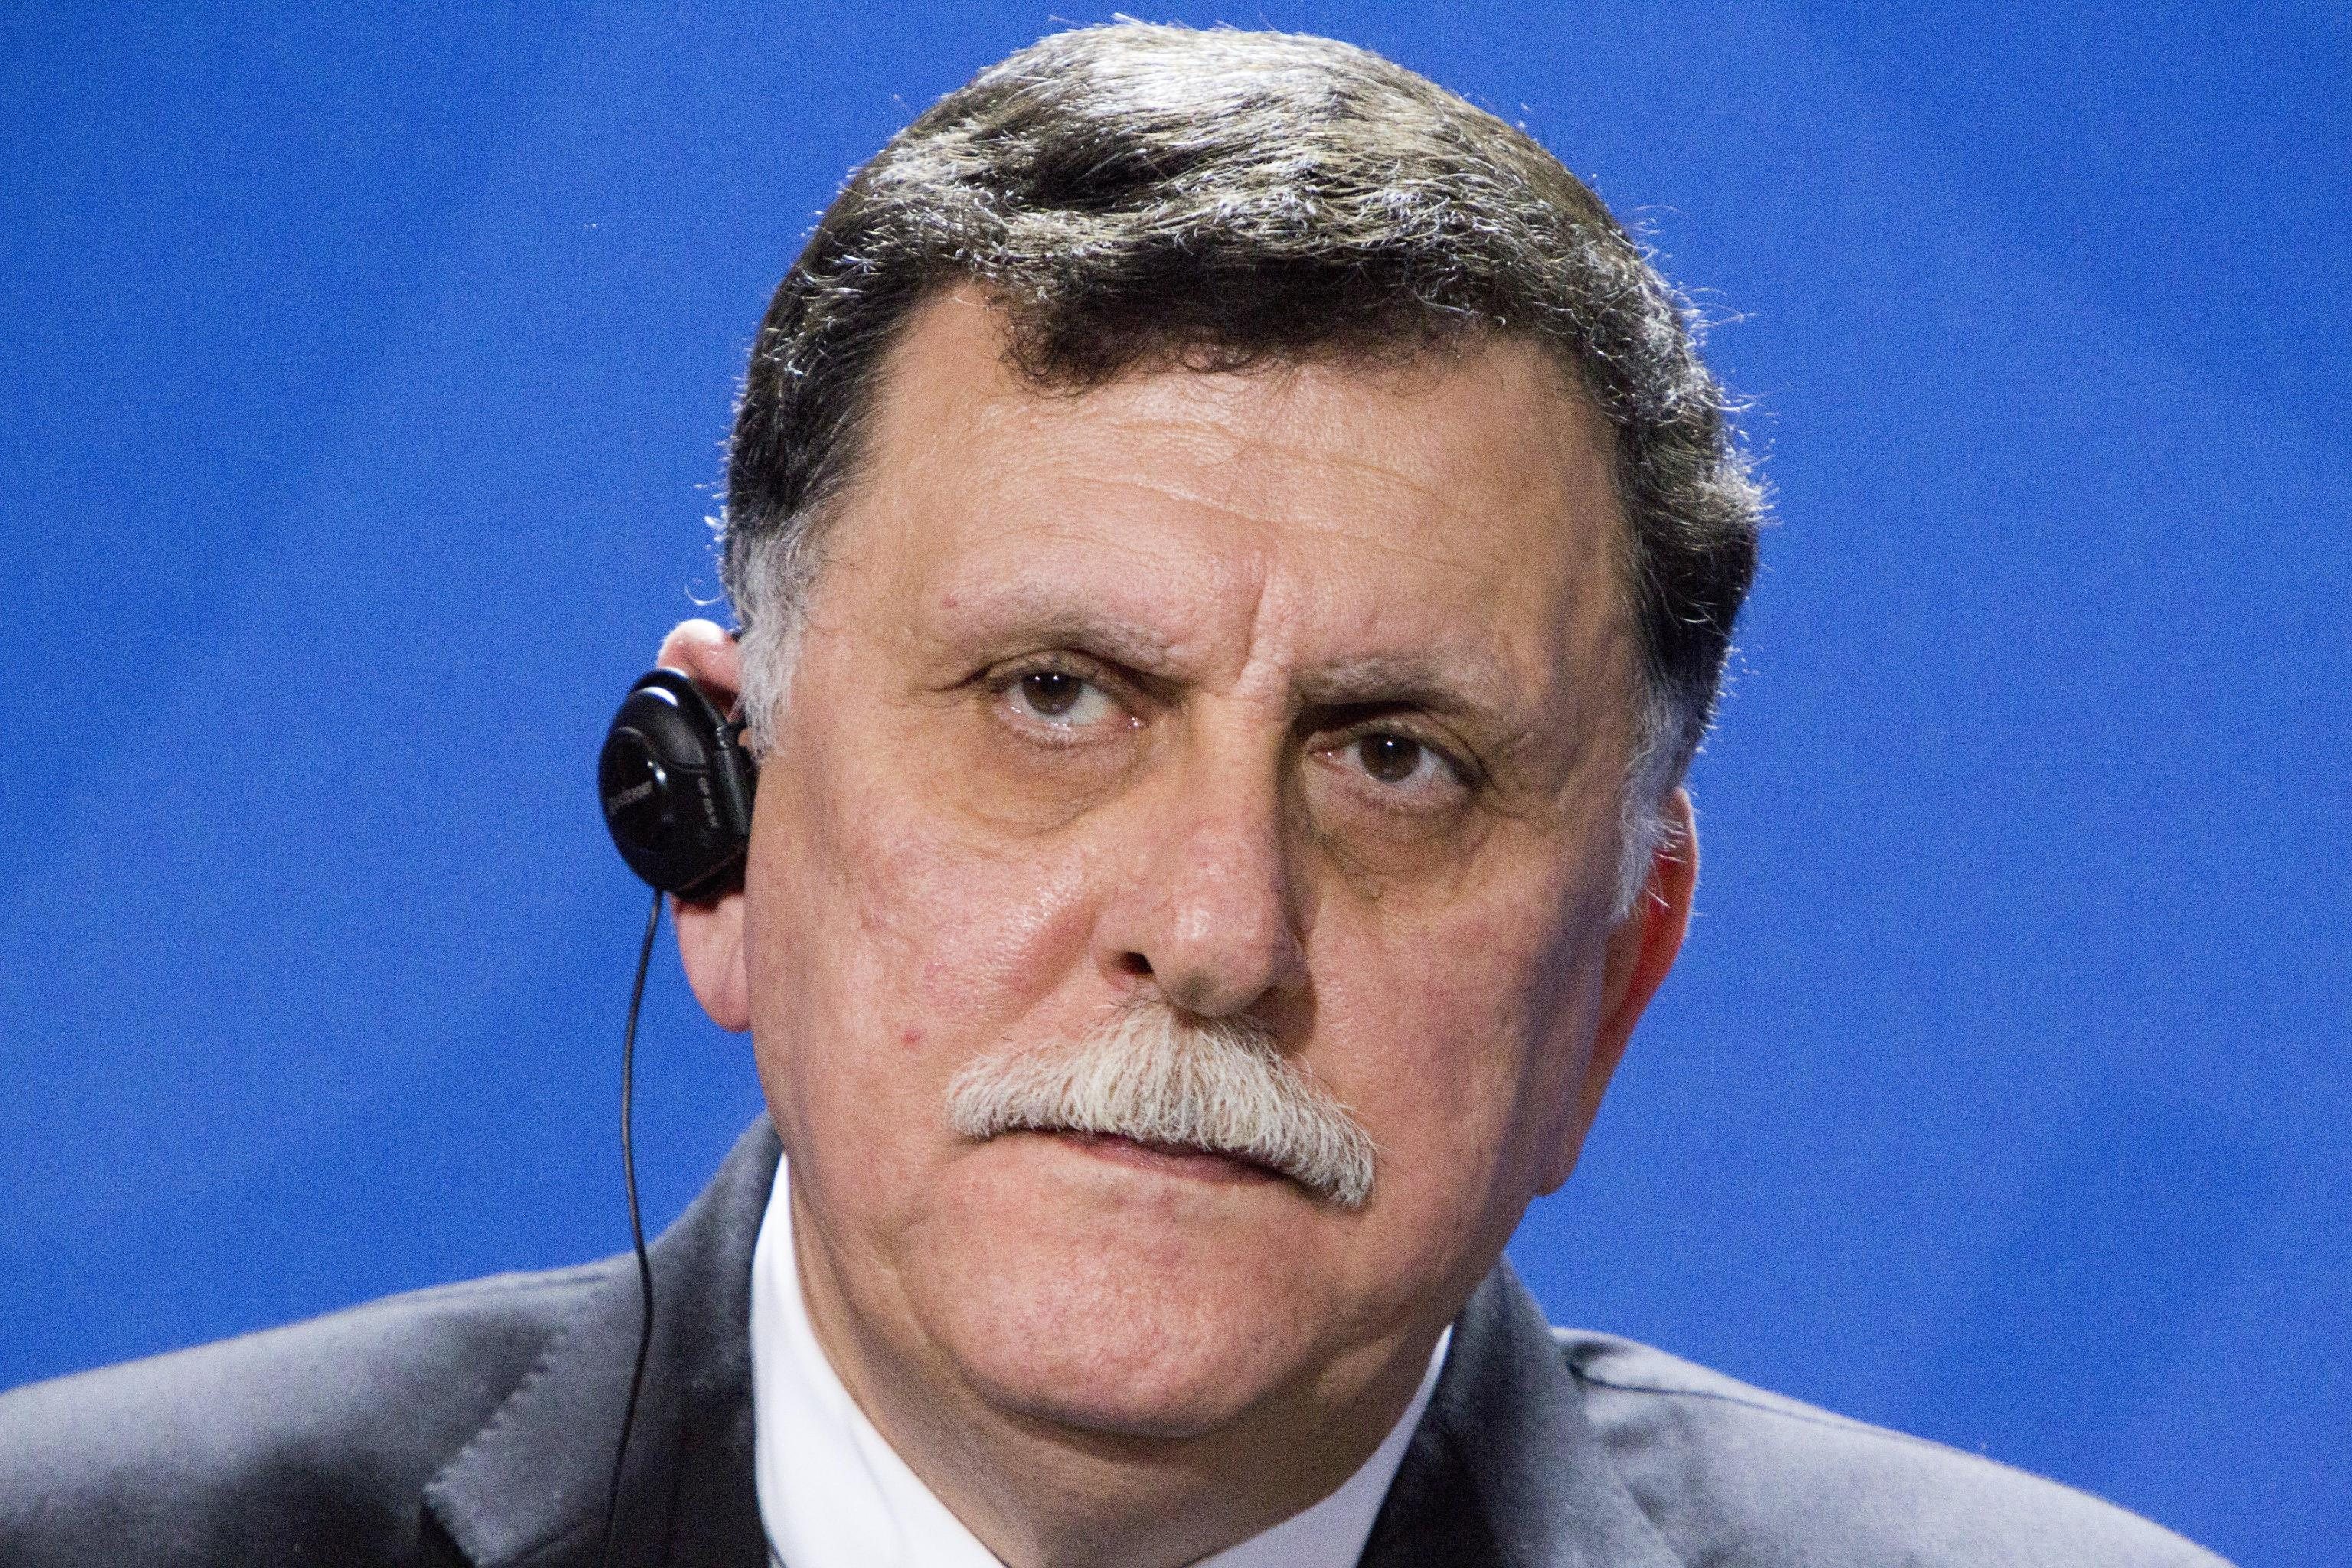 Libia,con Italia 'sala' anti-trafficanti